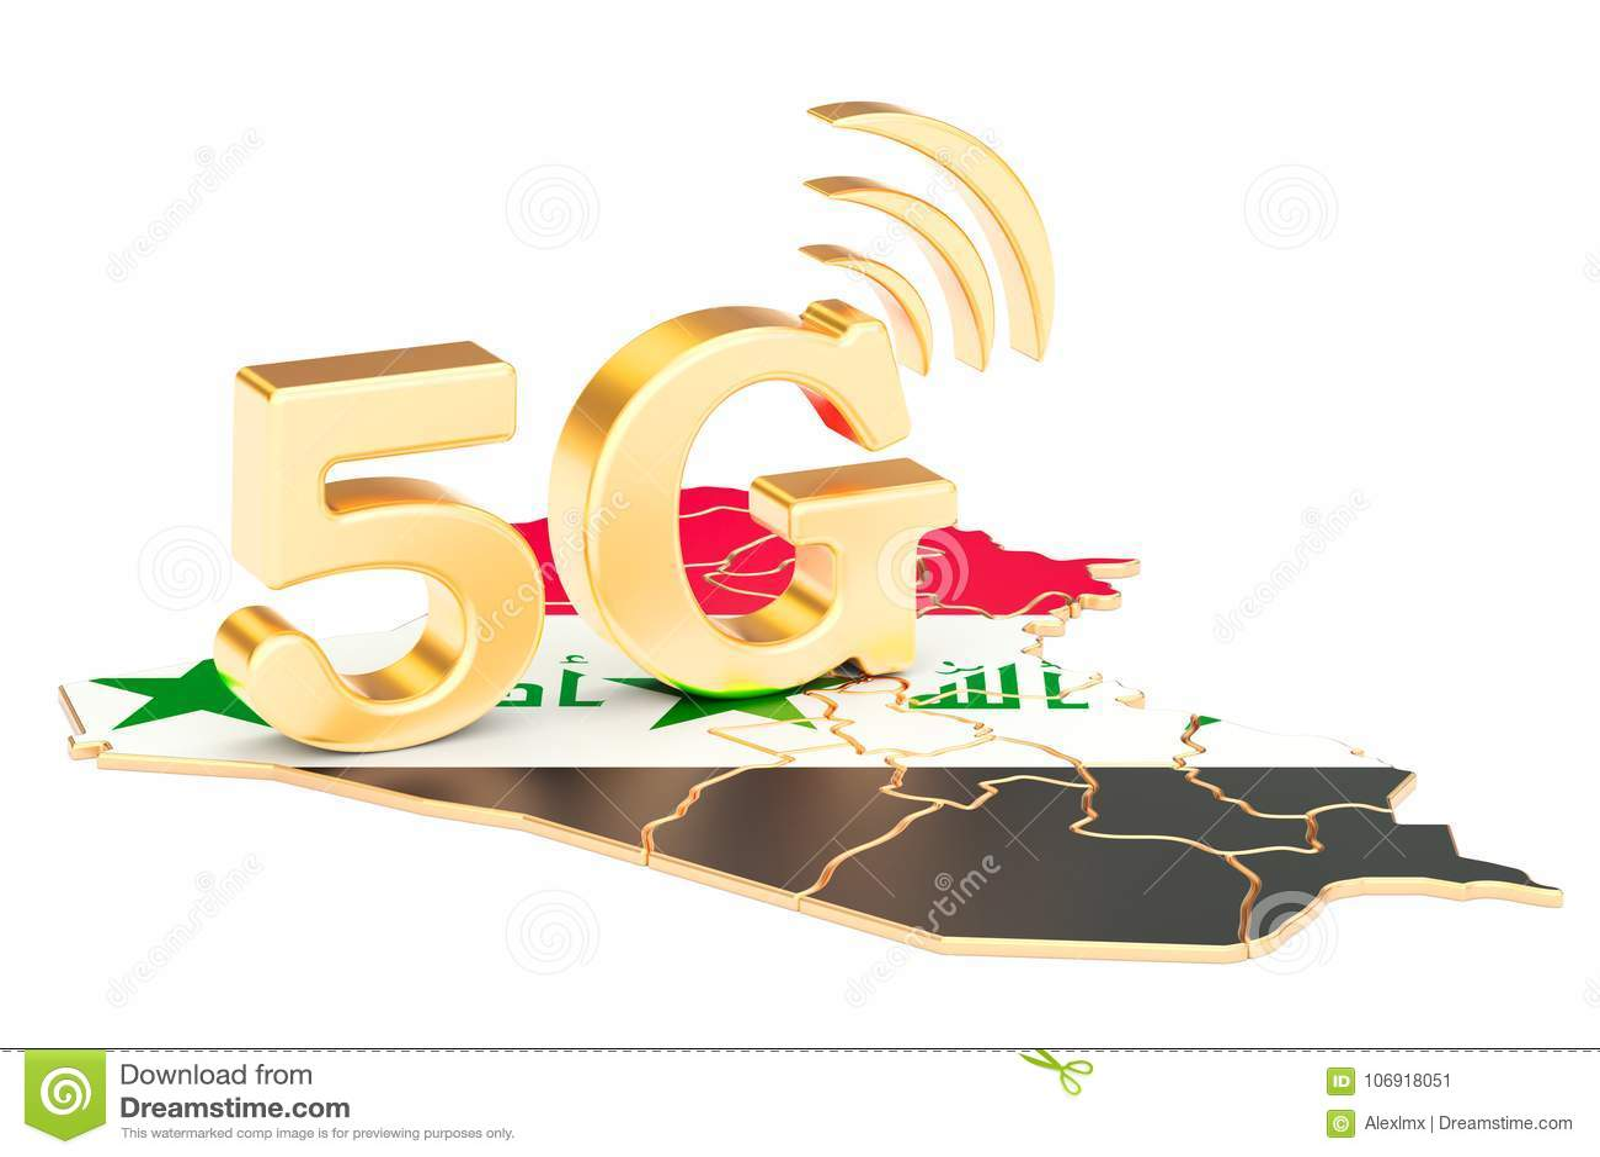 5G w Irackim pojęciu, 3D rendering